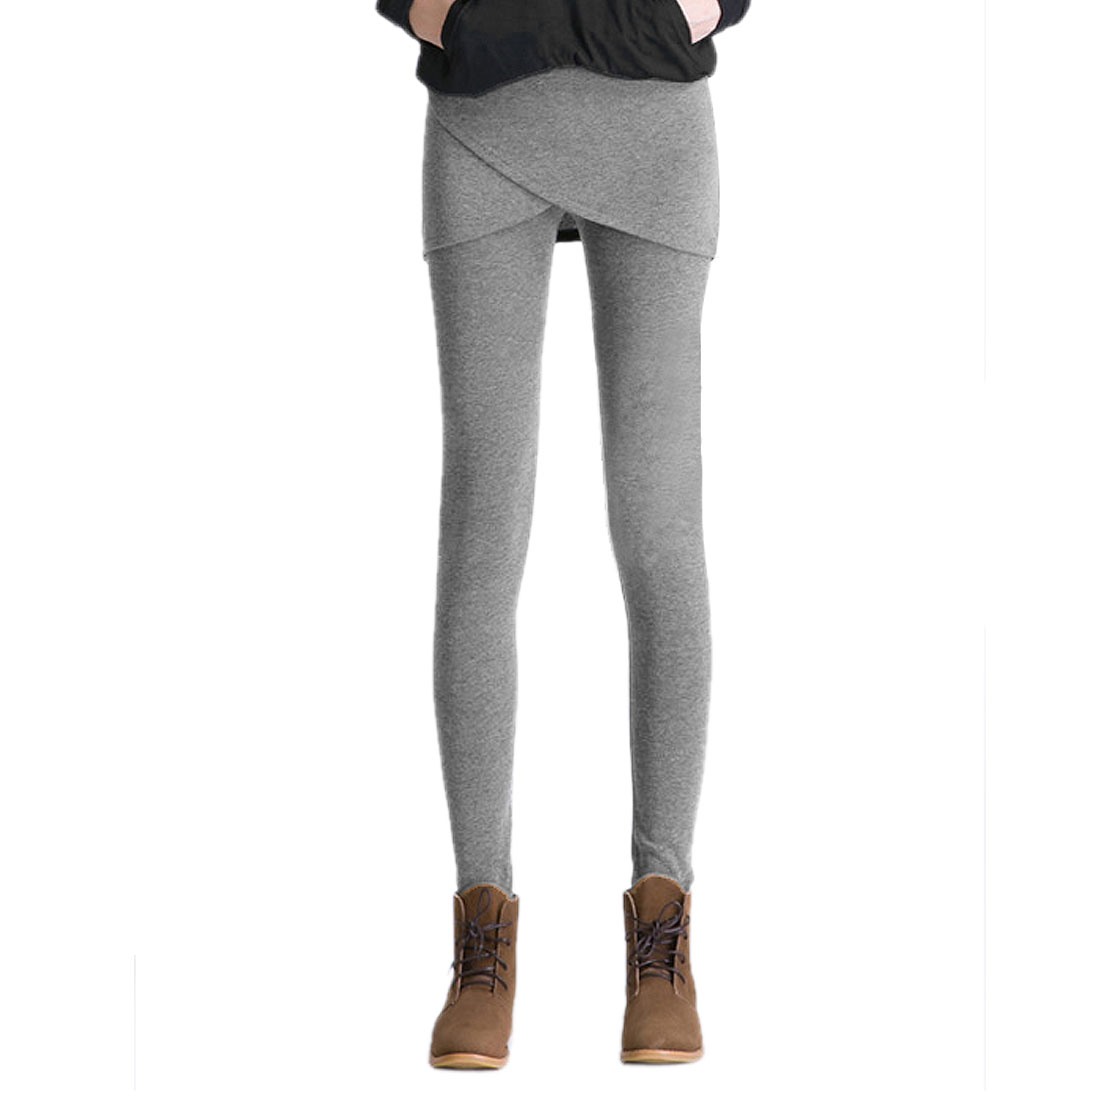 XS Gray Cropped Hem Footless Stretchy Waist Warm Long Pants Skirt Leggings